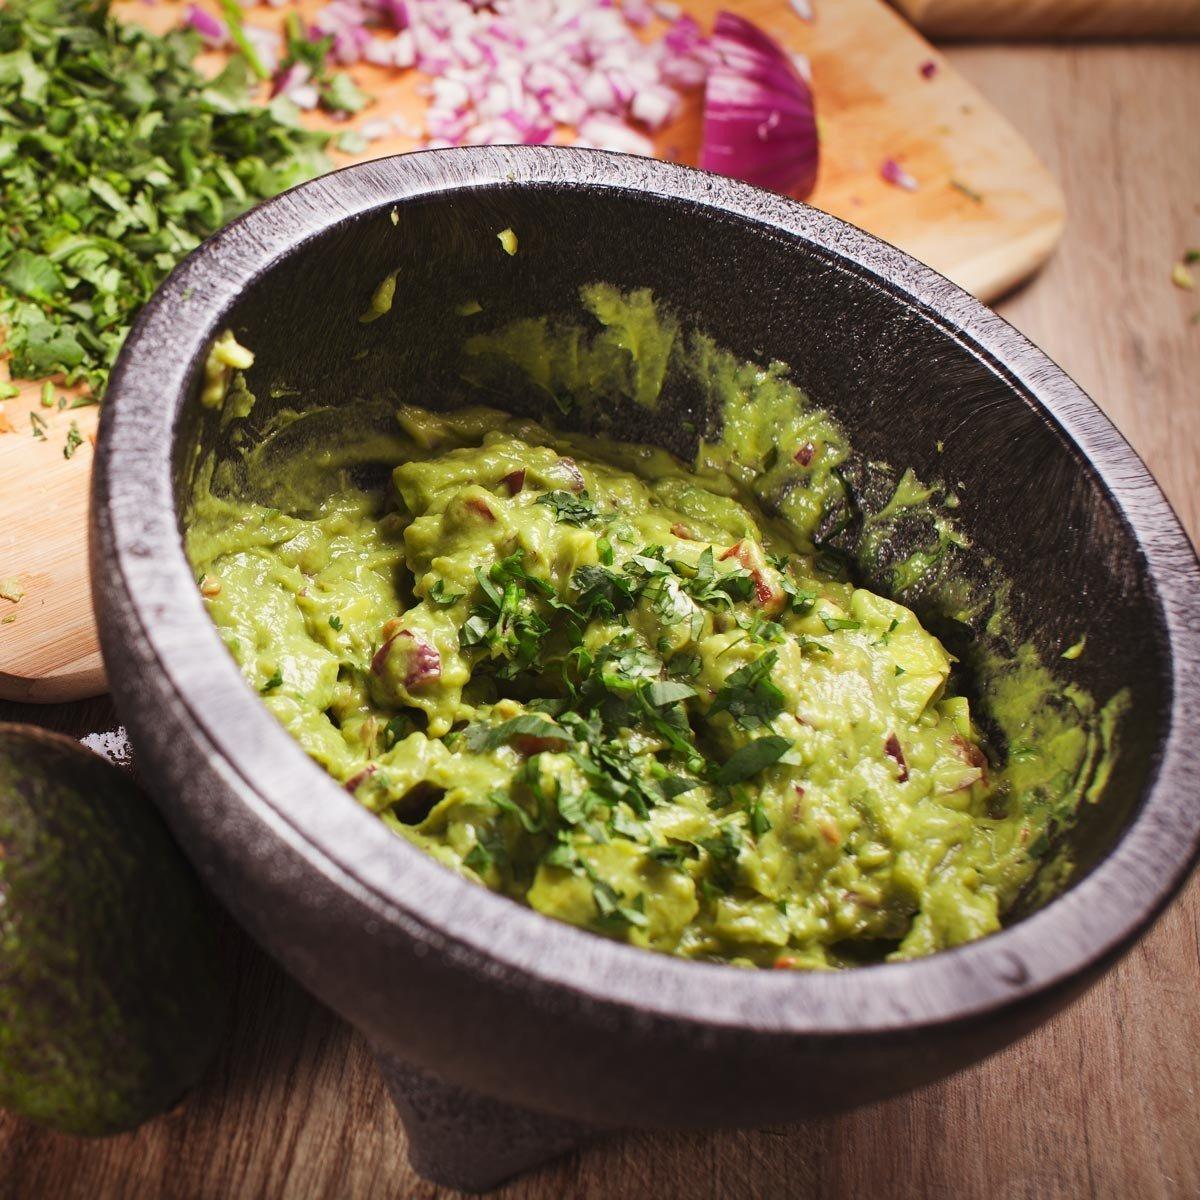 Amazon.com | 3pk SALSA BOWLS set Tazón para Salsas Bonita Home - BPA FREE: Serving Bowls